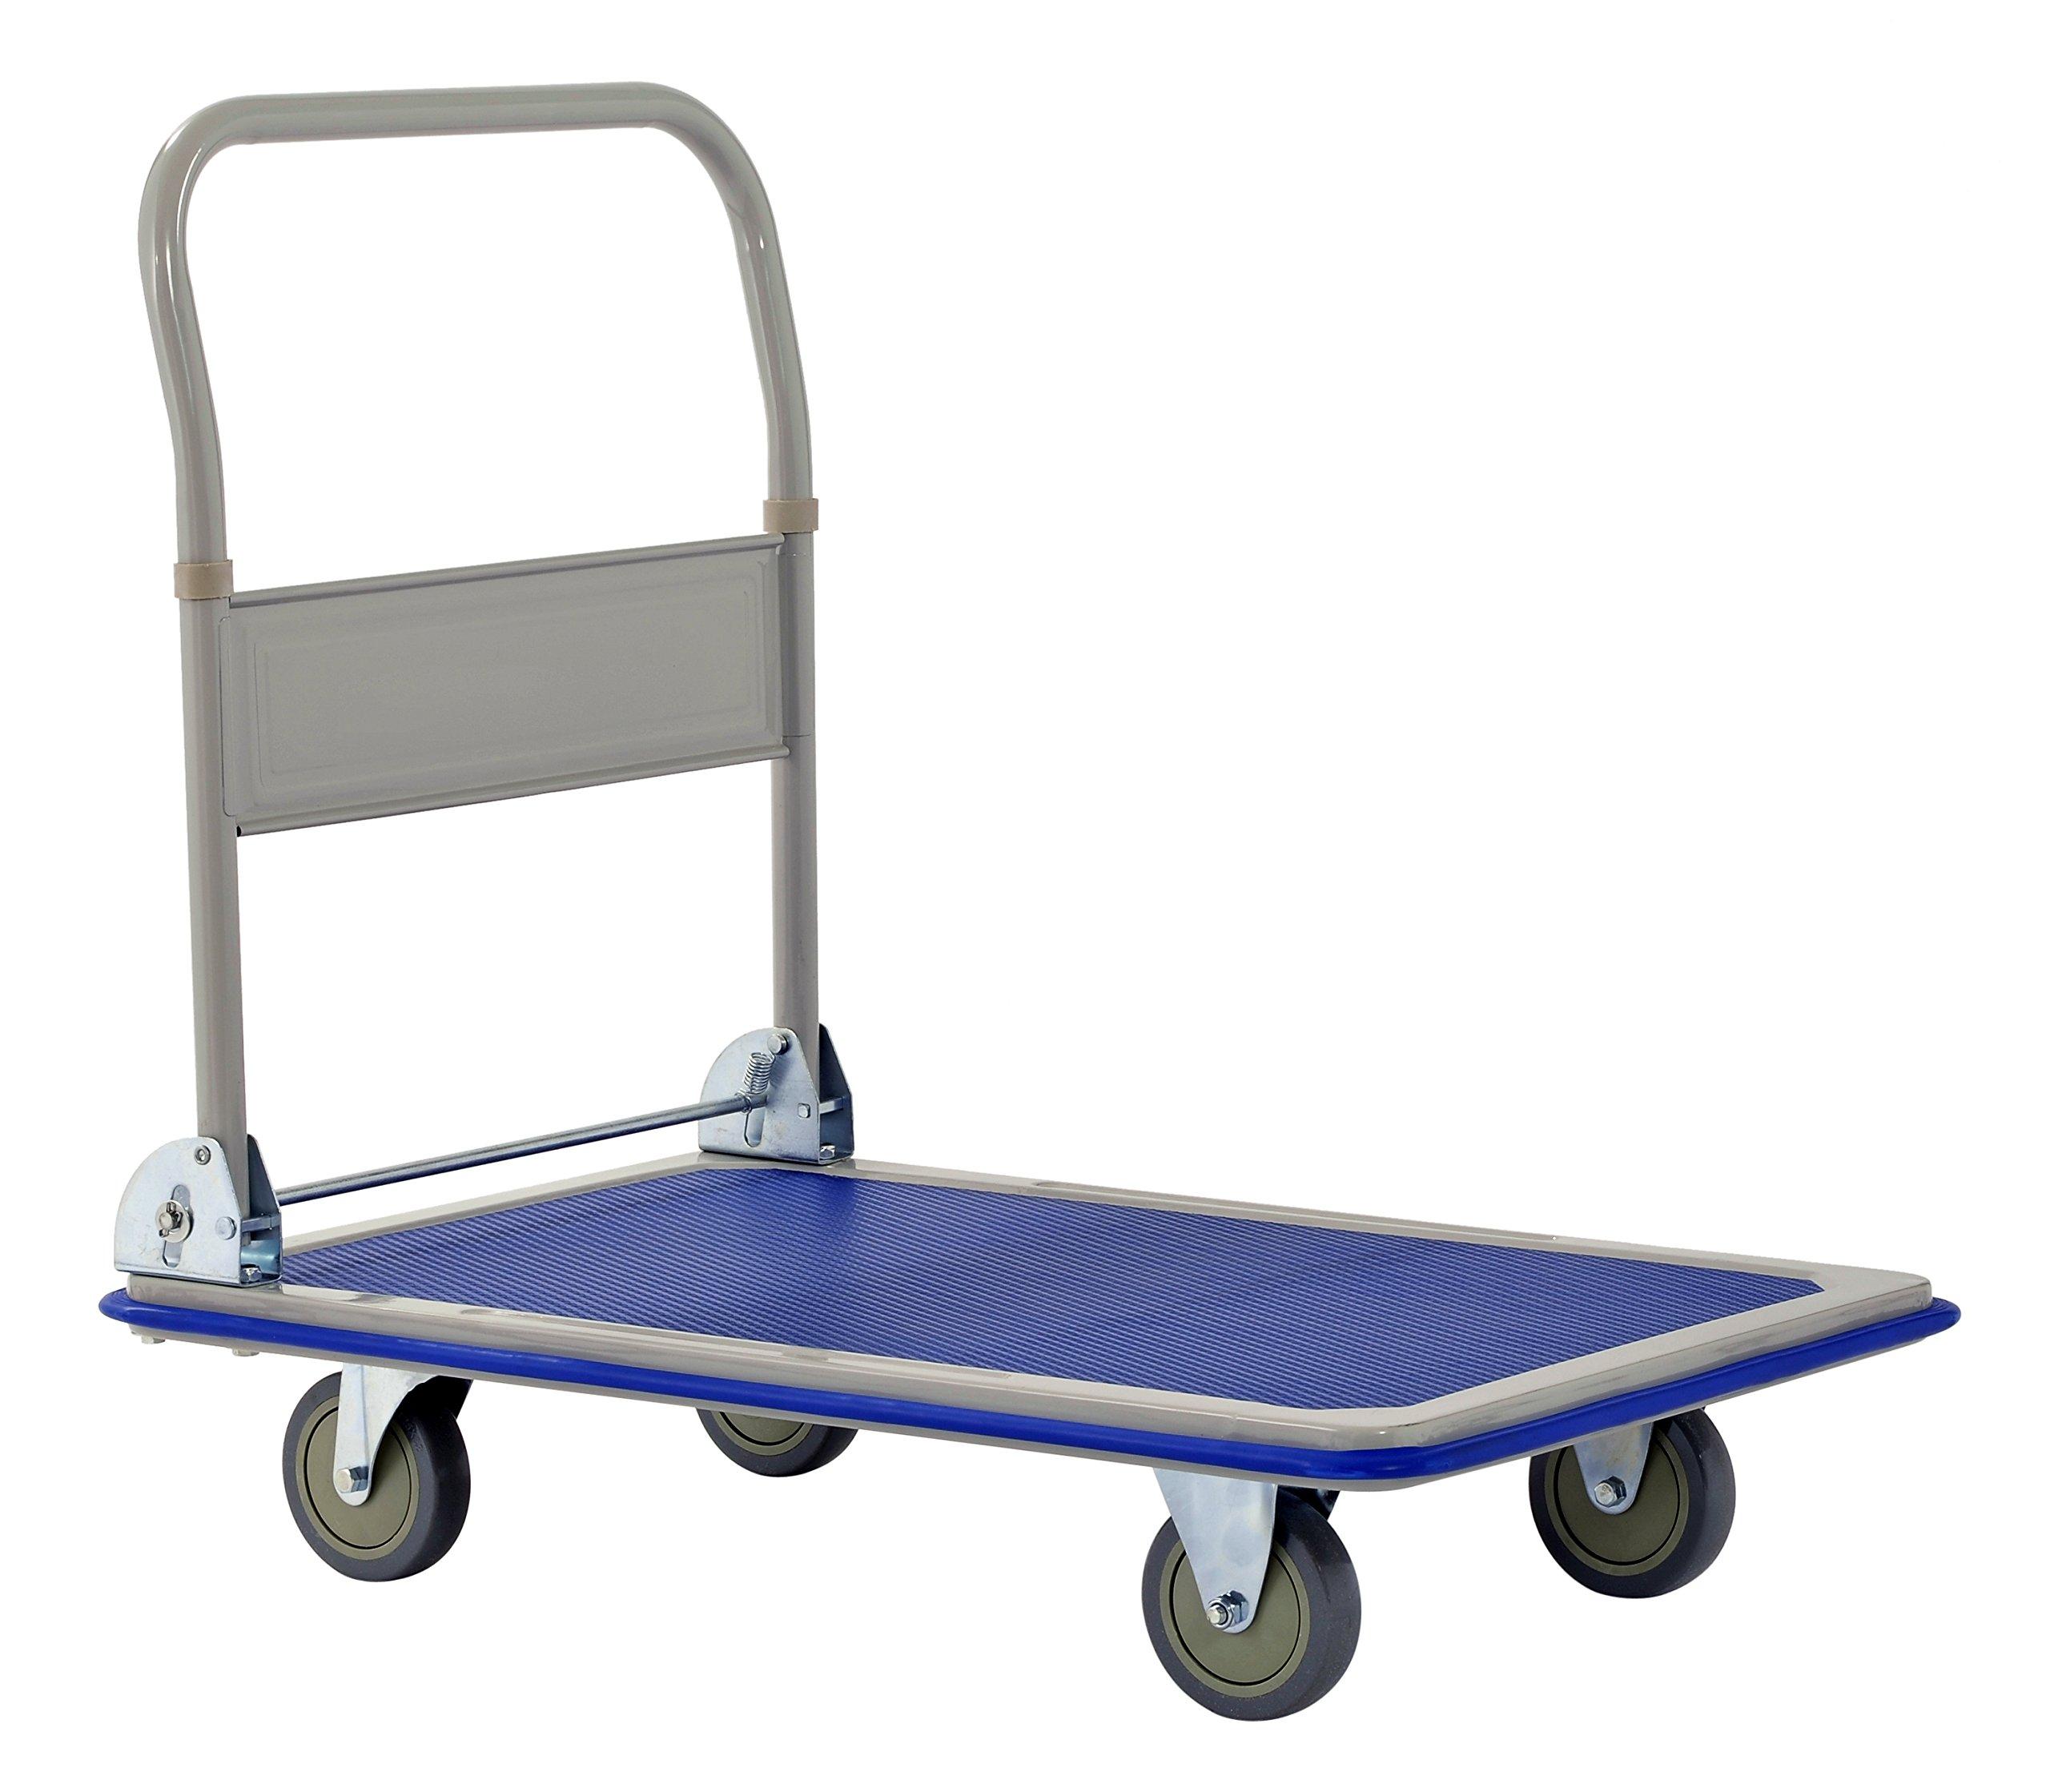 Muscle Rack FPC3623 Heavy Duty 660 lb. Capacity Folding Platform Cart, 11.02'' Height, 23.2'' Width, 35.4'' Length, 660 Pounds Load Capacity